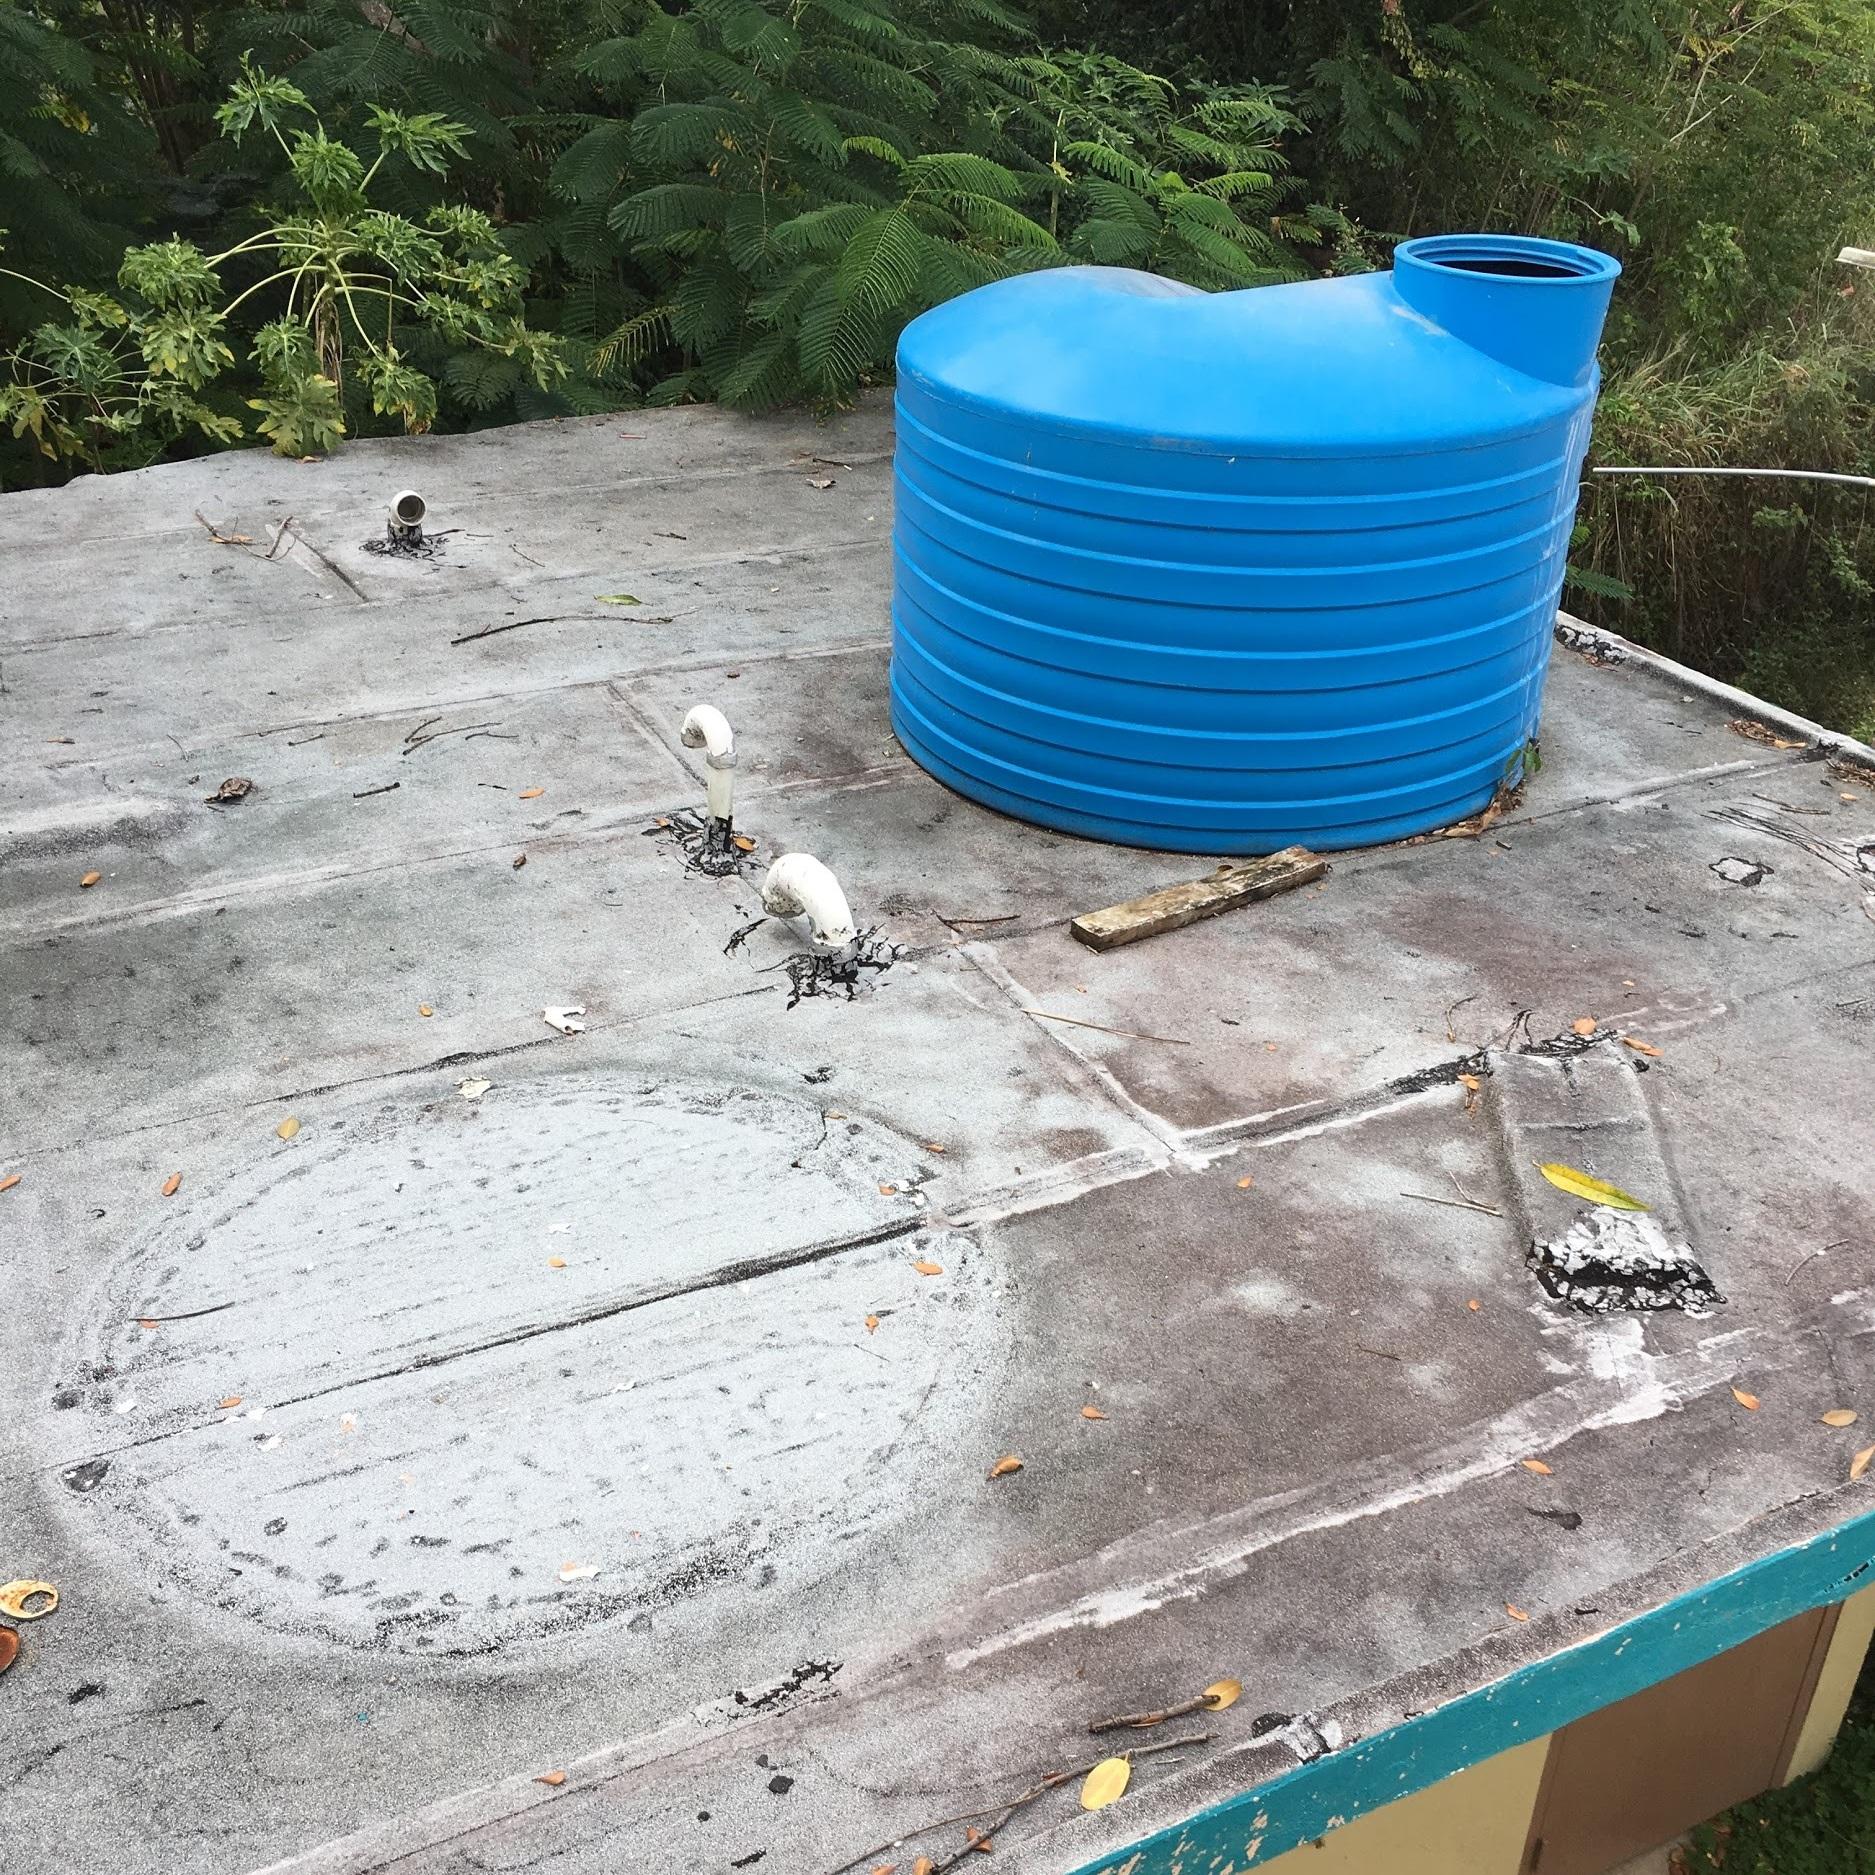 Plastic Rainwater Collection Reservoir at Superhero Foundation